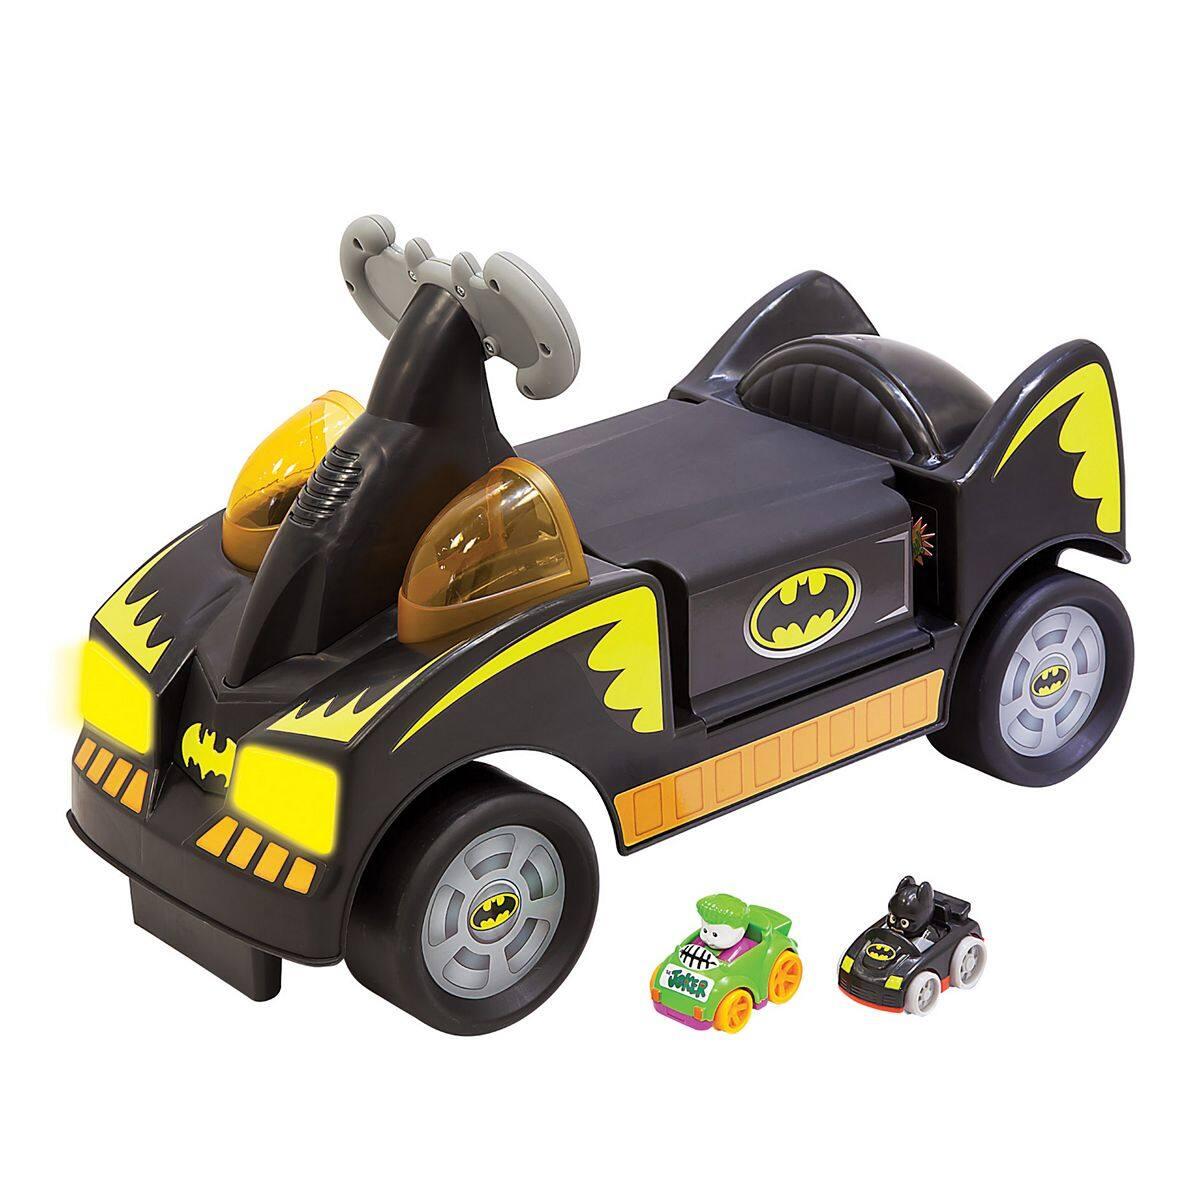 Batman Wheelies Ride-On $20, Little Tikes Easy Score Basketball Hoop Set $20, Step2 Shopping Cart $20, Vtech Stroll & Discover Activity Walker $20, More + free pickup at Kohls